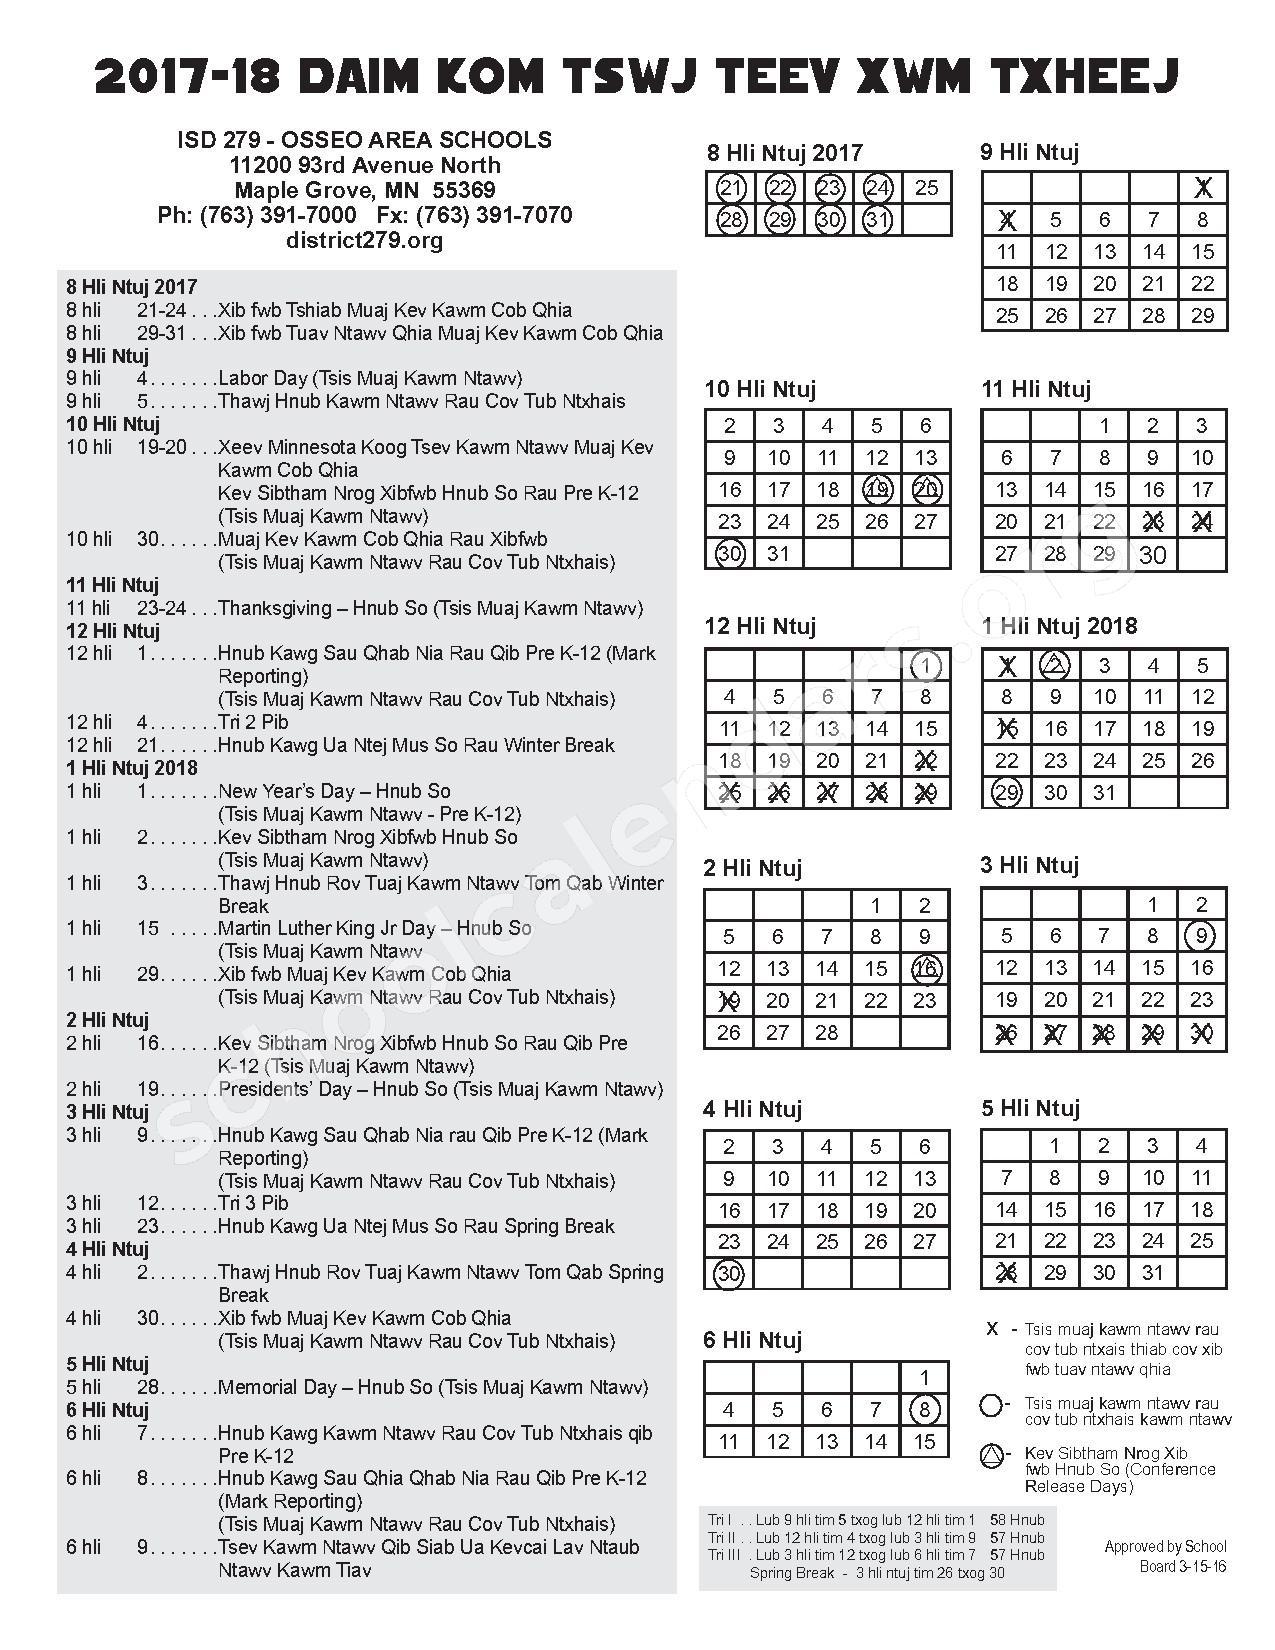 2017 - 2018 Hmoob Calendar – Edinbrook Elementary School – page 1